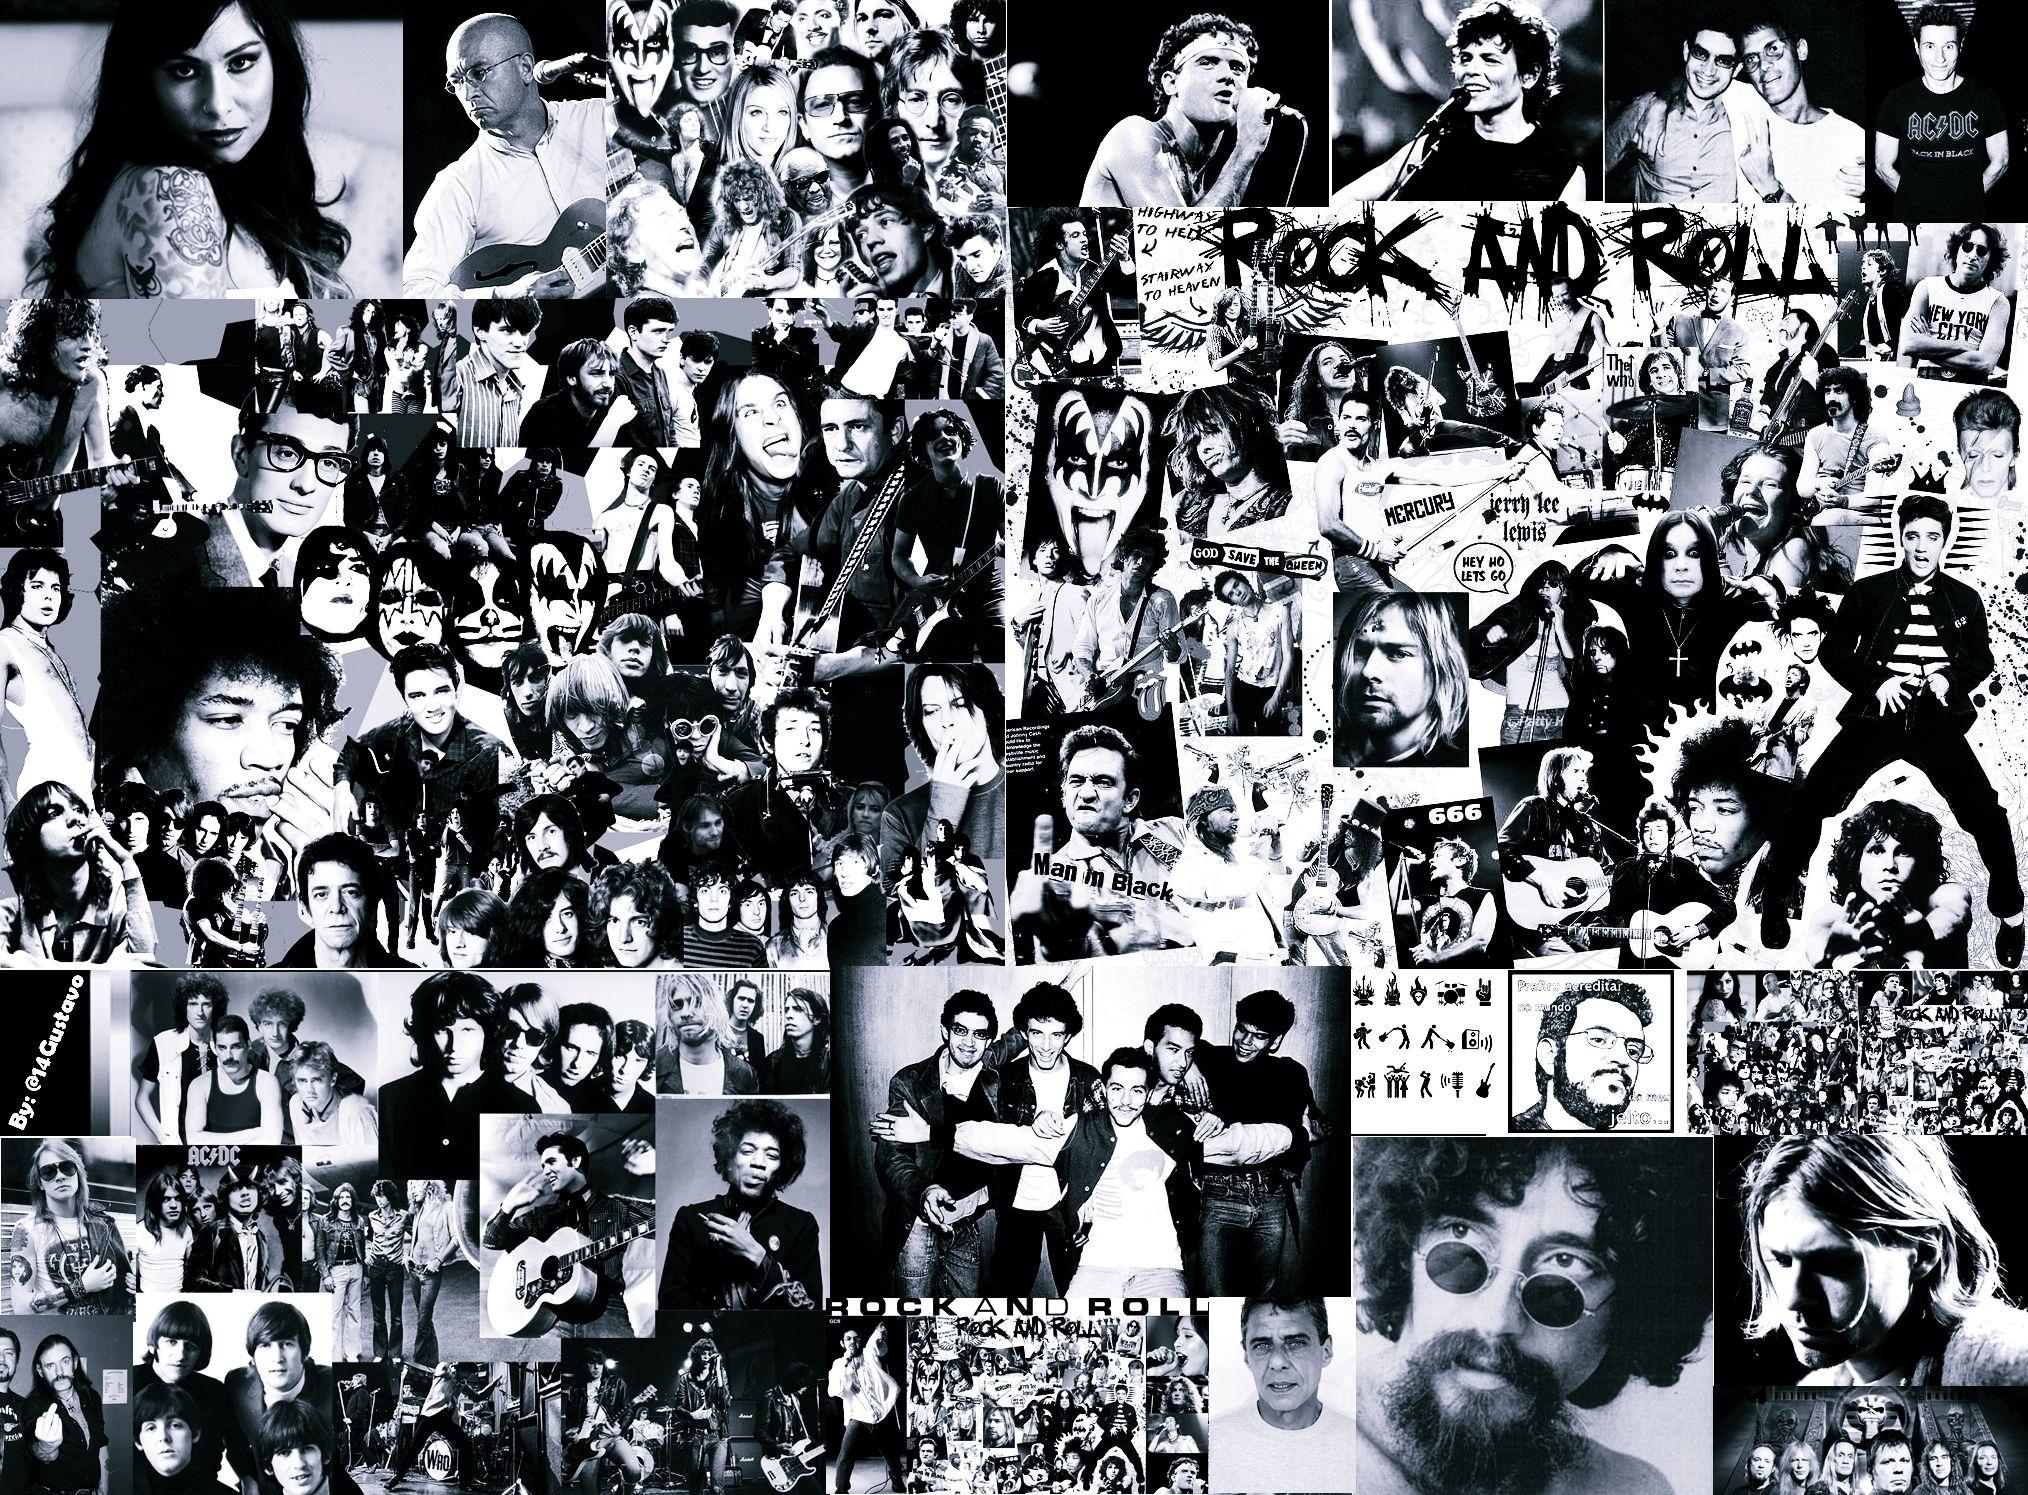 04.23.15 - 1024x768 rock n roll desktop wallpapers - music